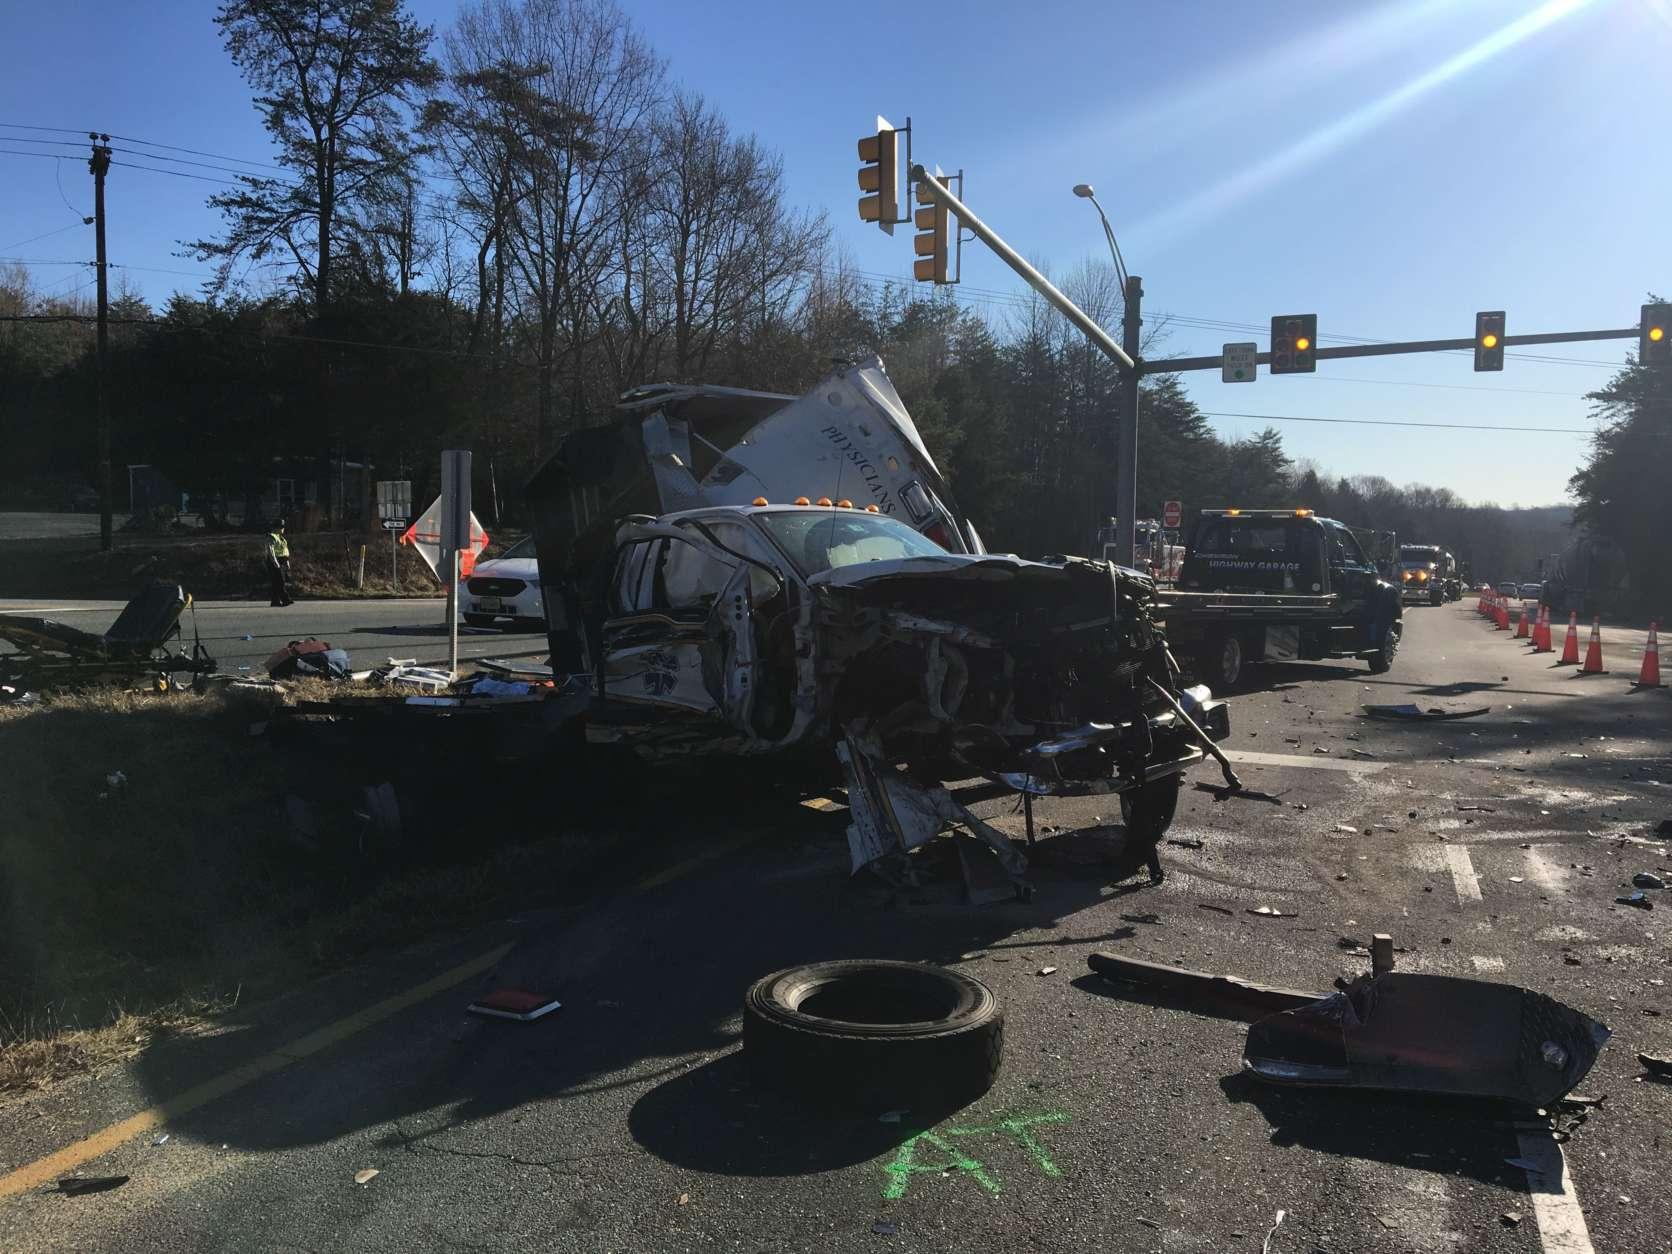 Tanker truck and ambulance crash in Stafford Co